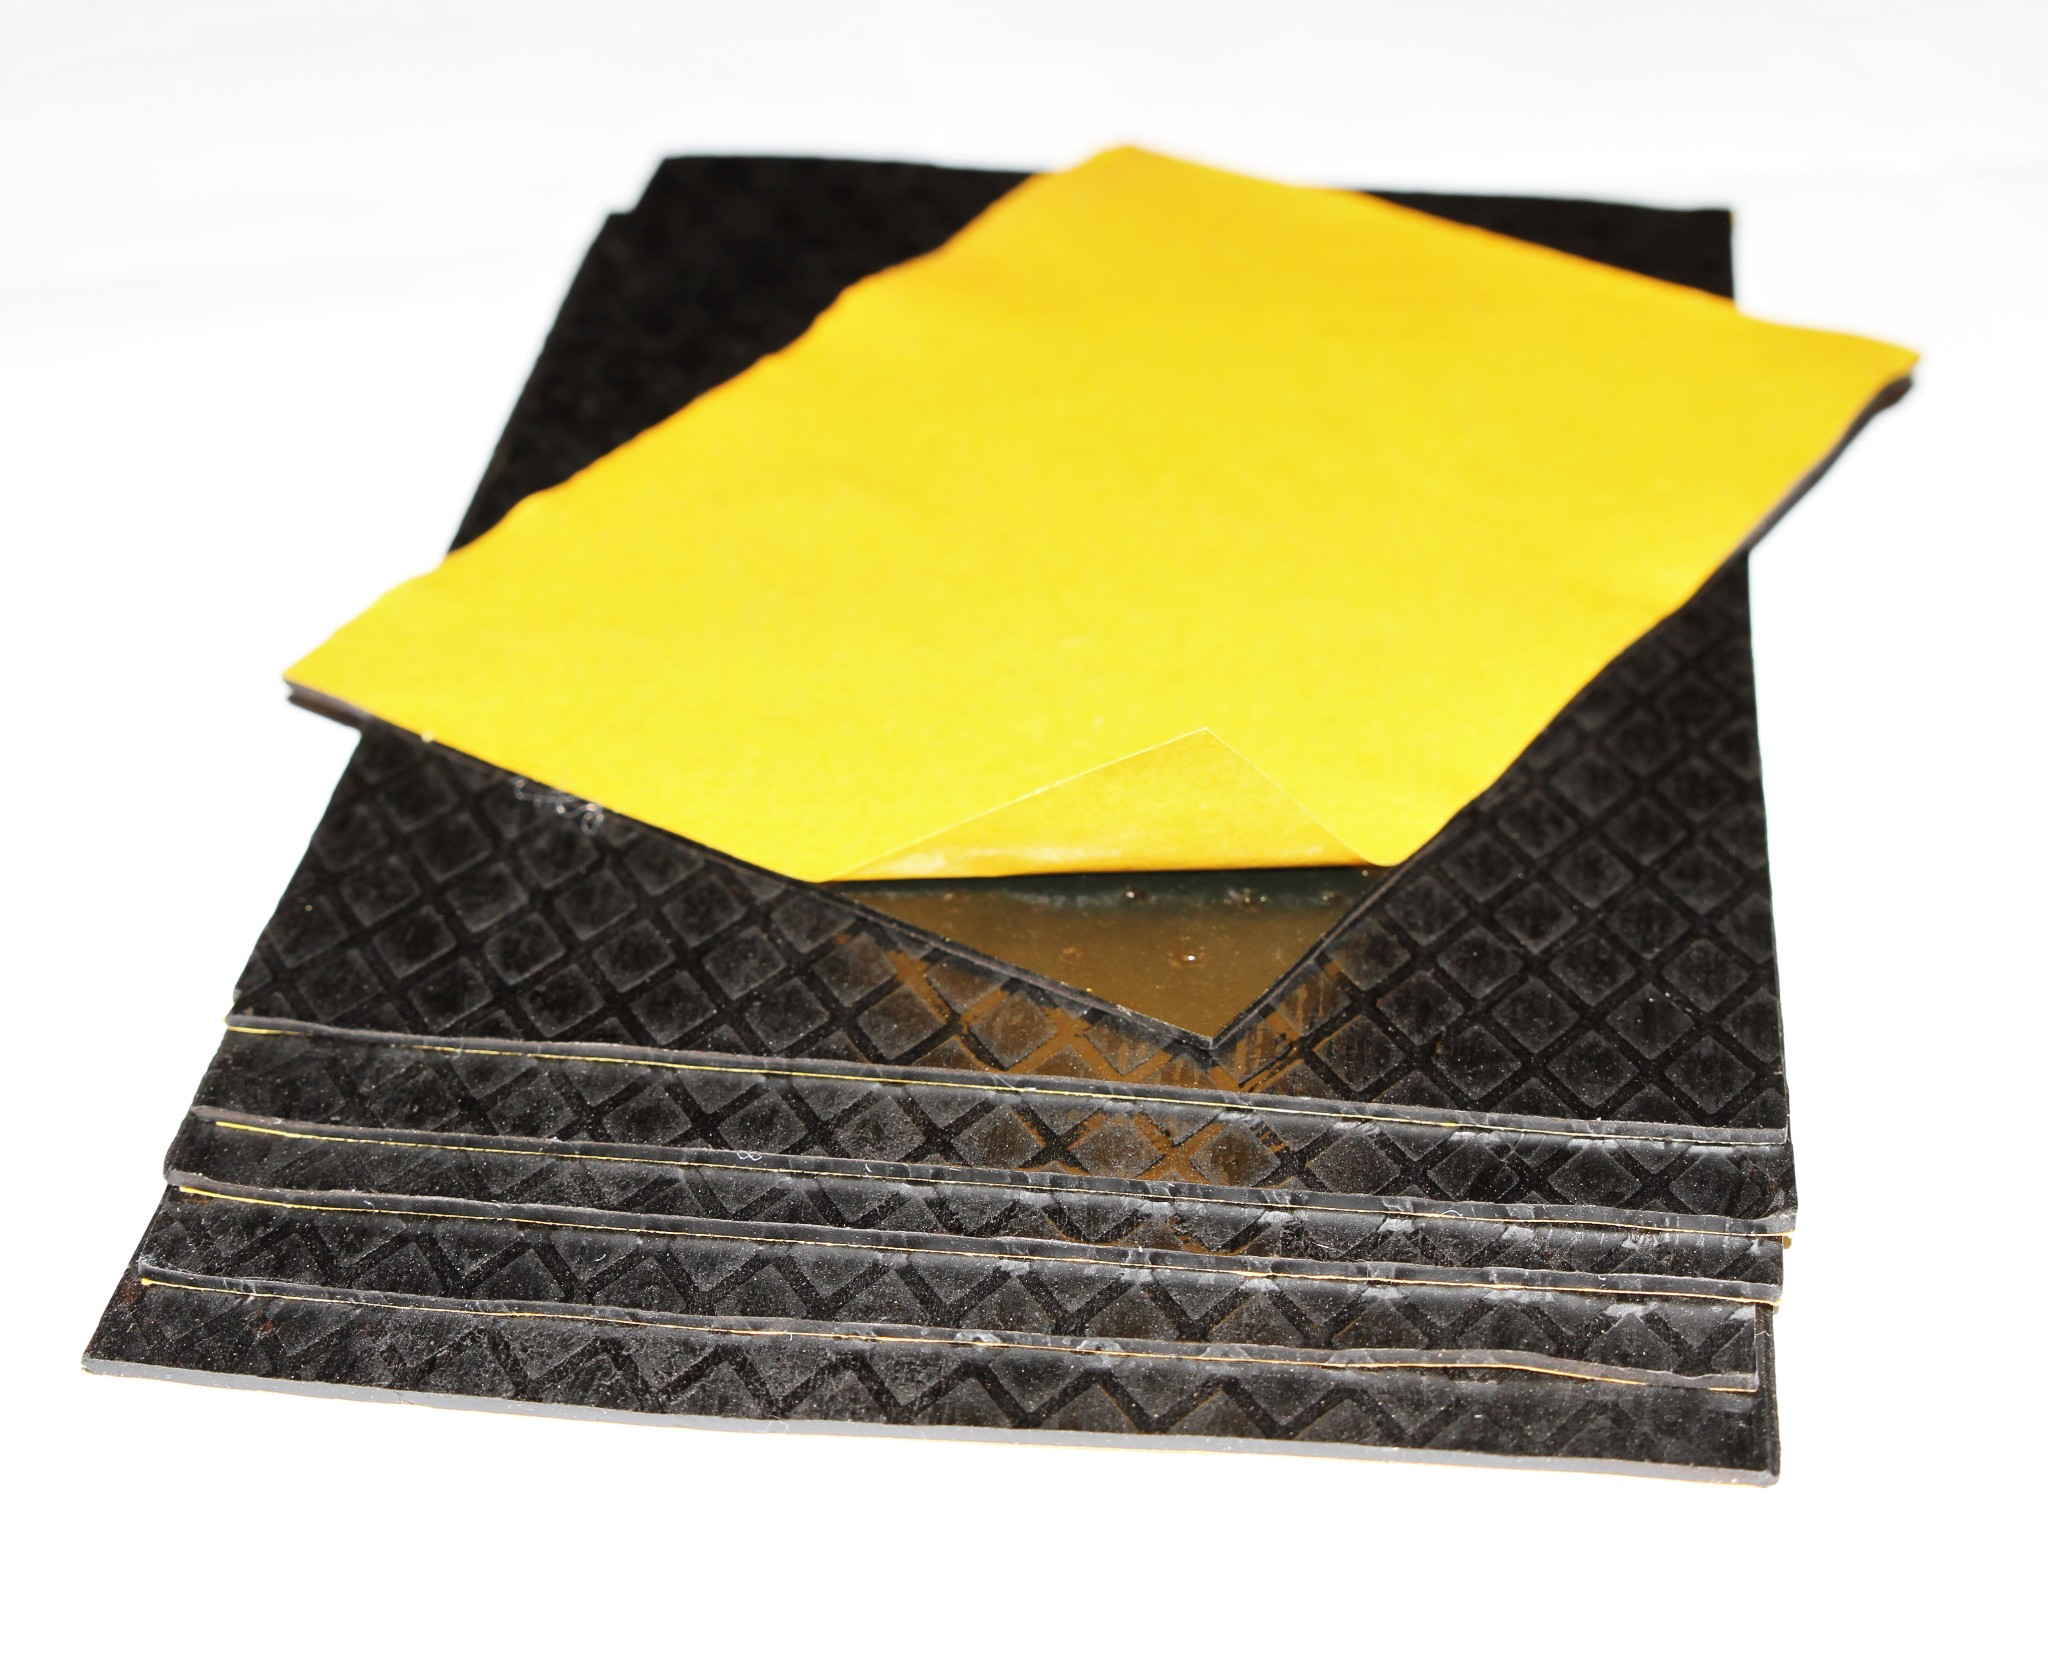 20 Large Sheets Bitflex 2 8kg Self Adhesive Flexible